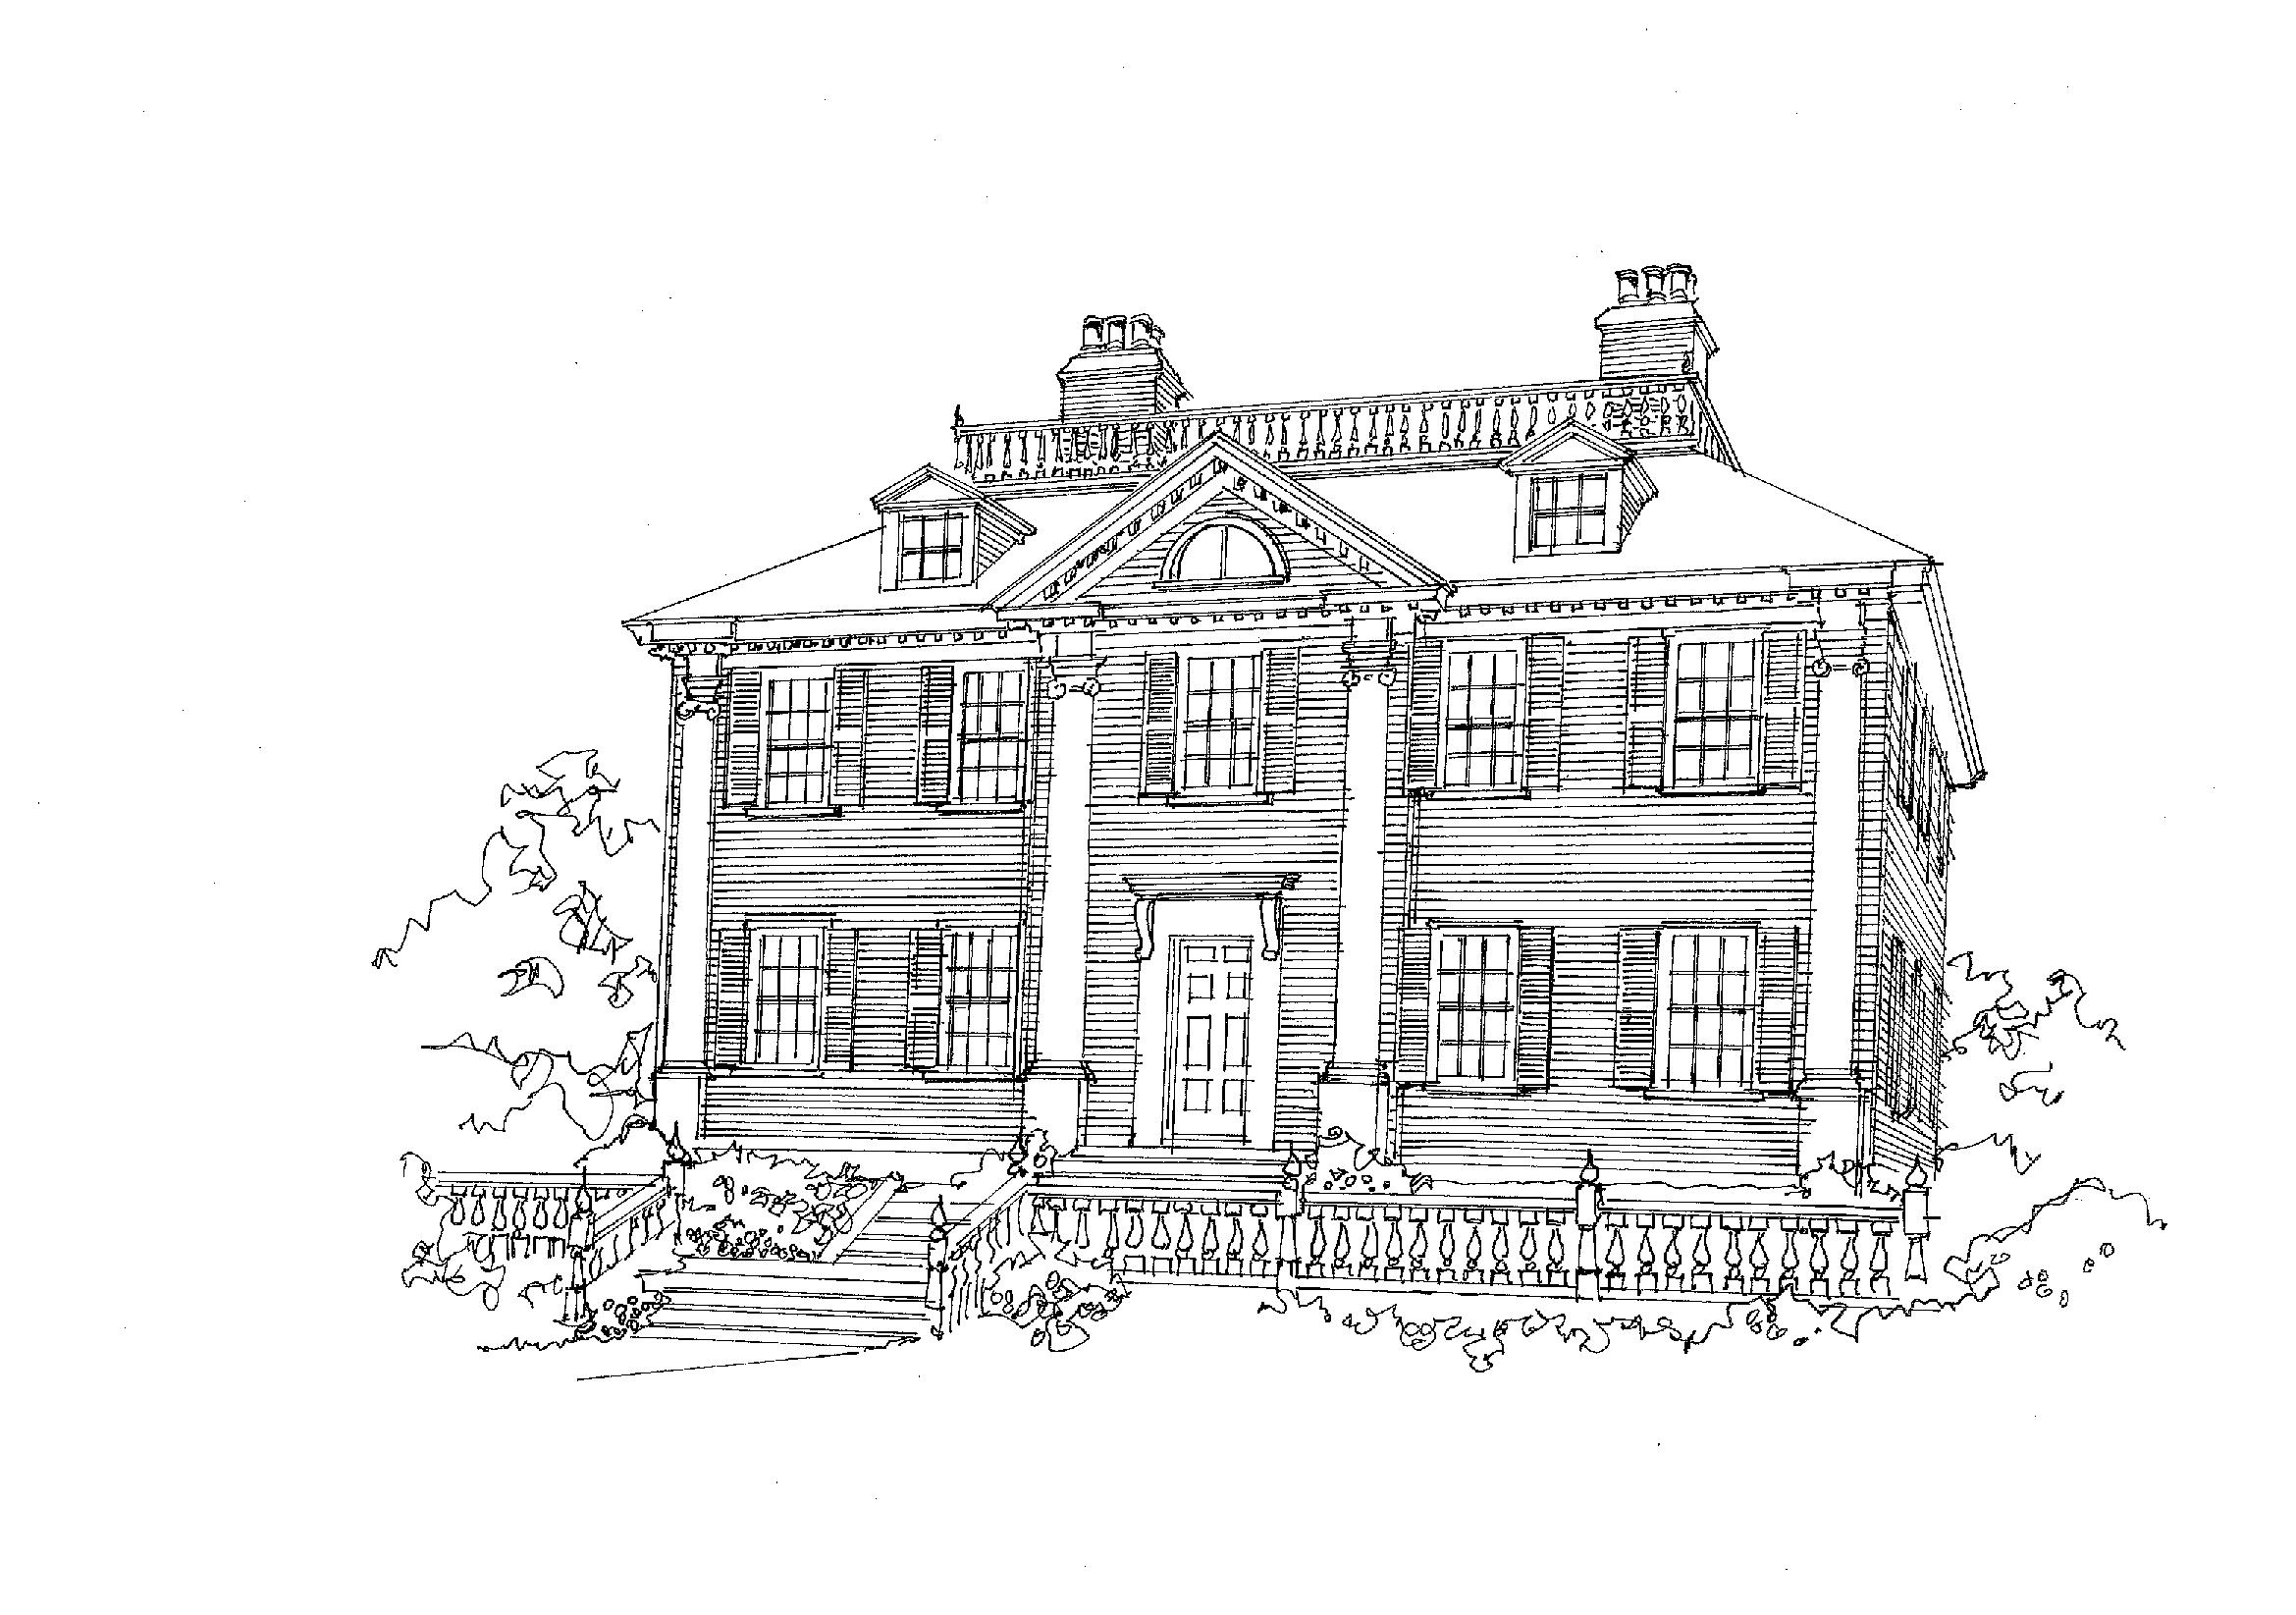 Longfellow House (1759)